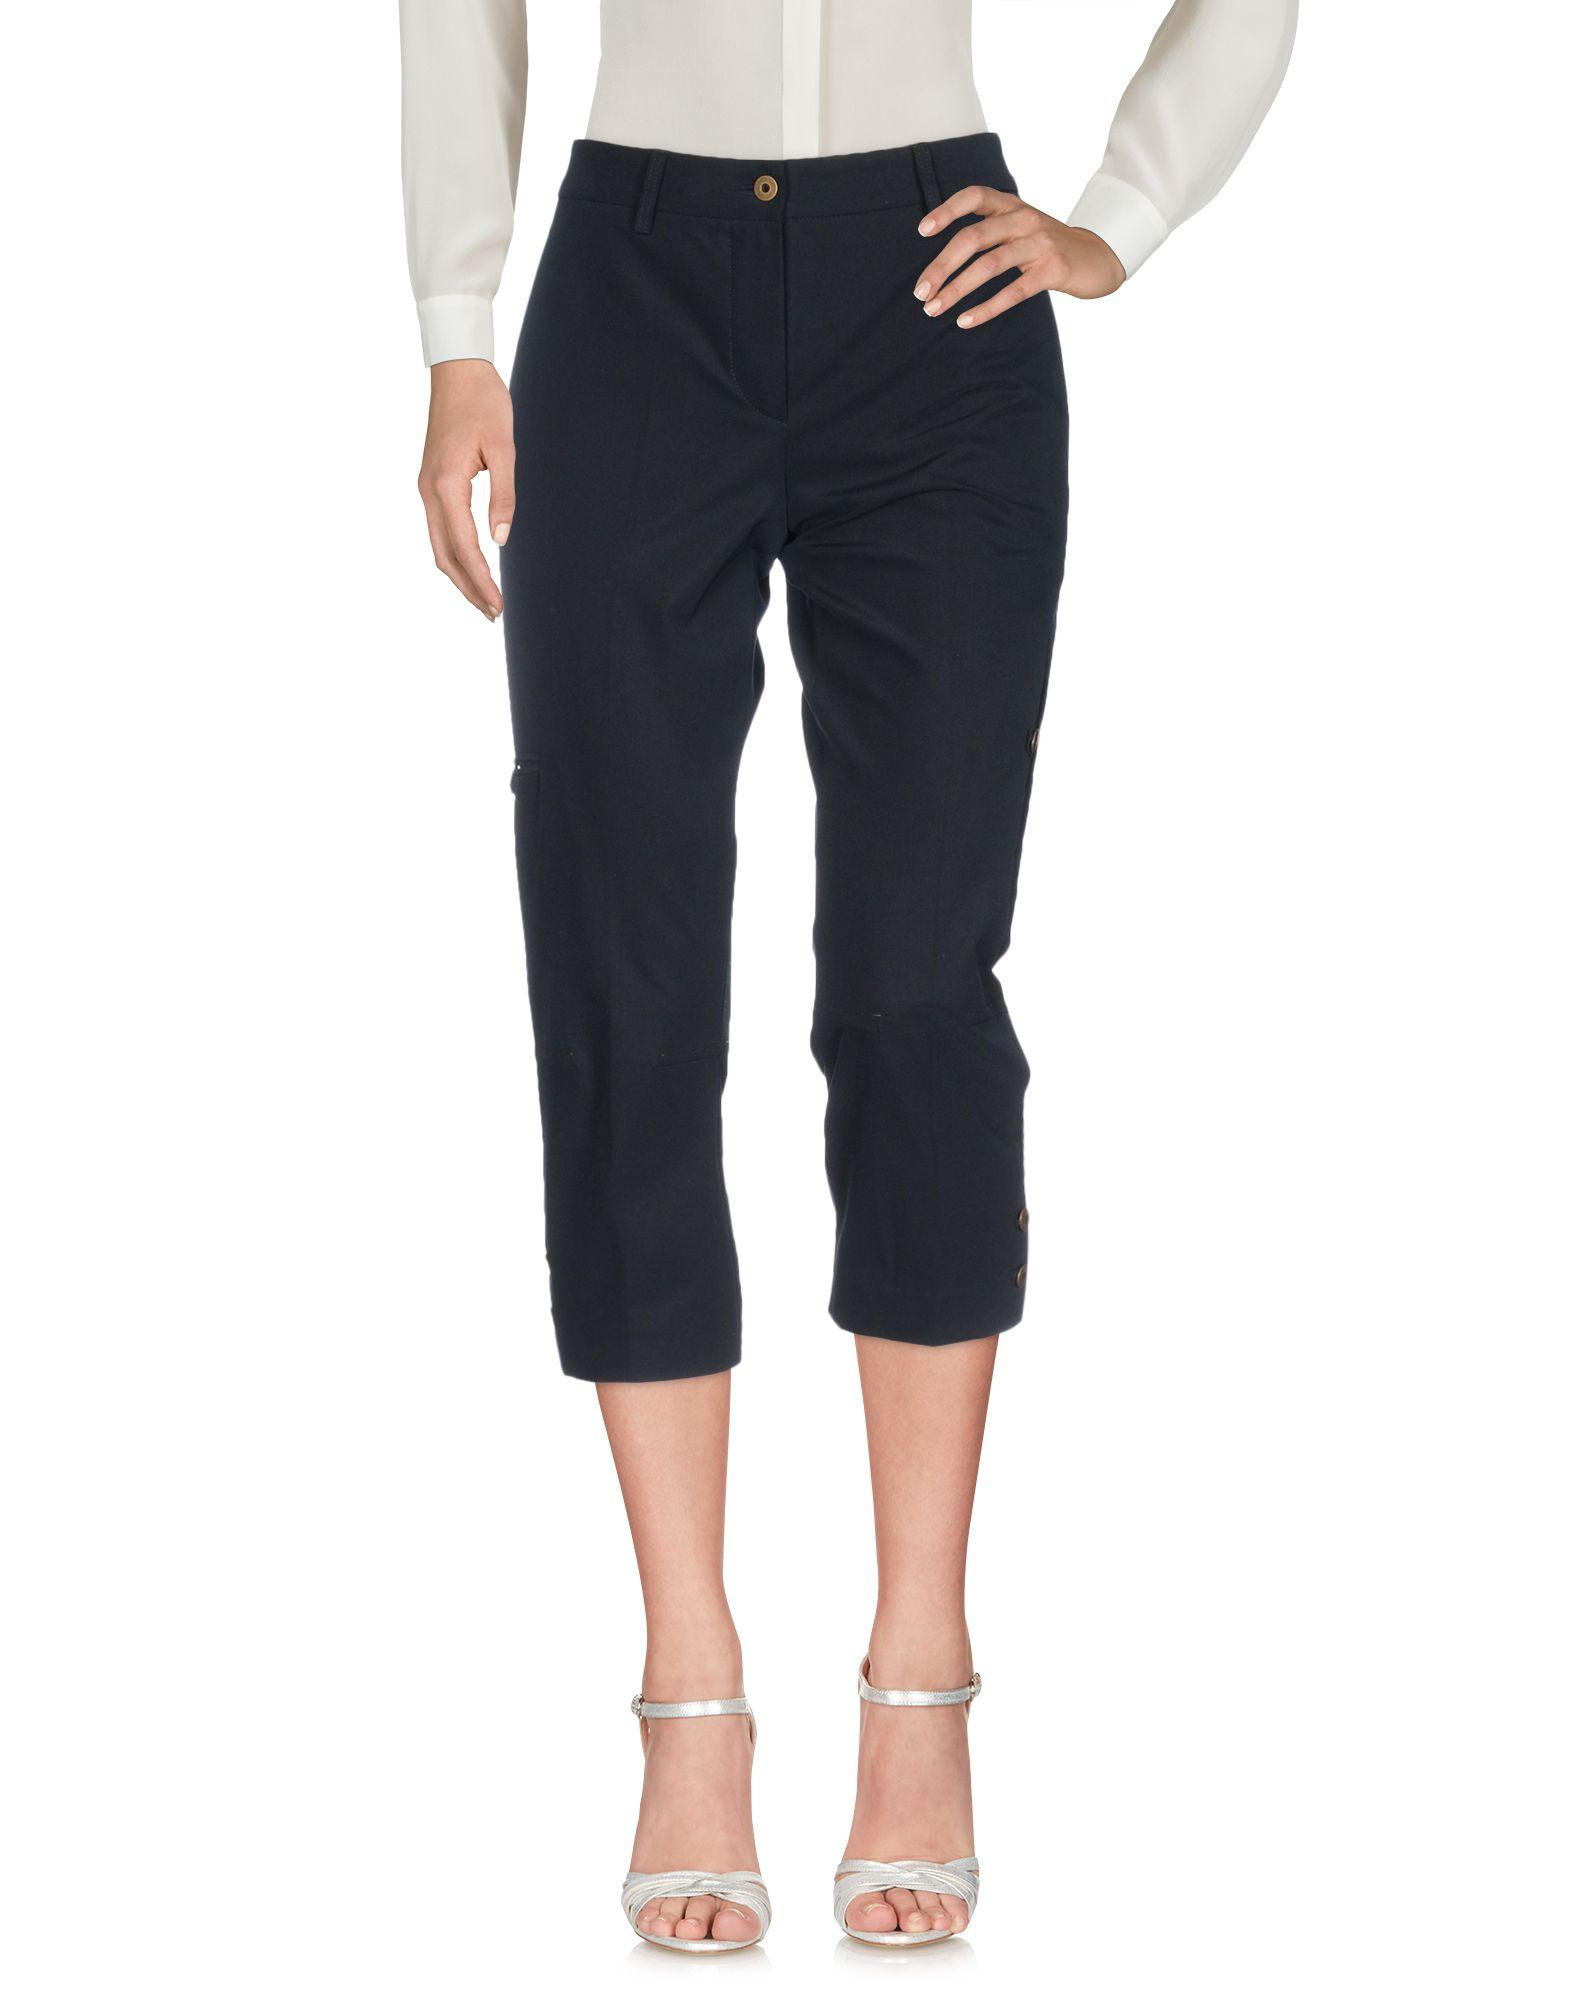 Pantalone Tapered Gunex Donna - Acquista online su wO38LU0plL